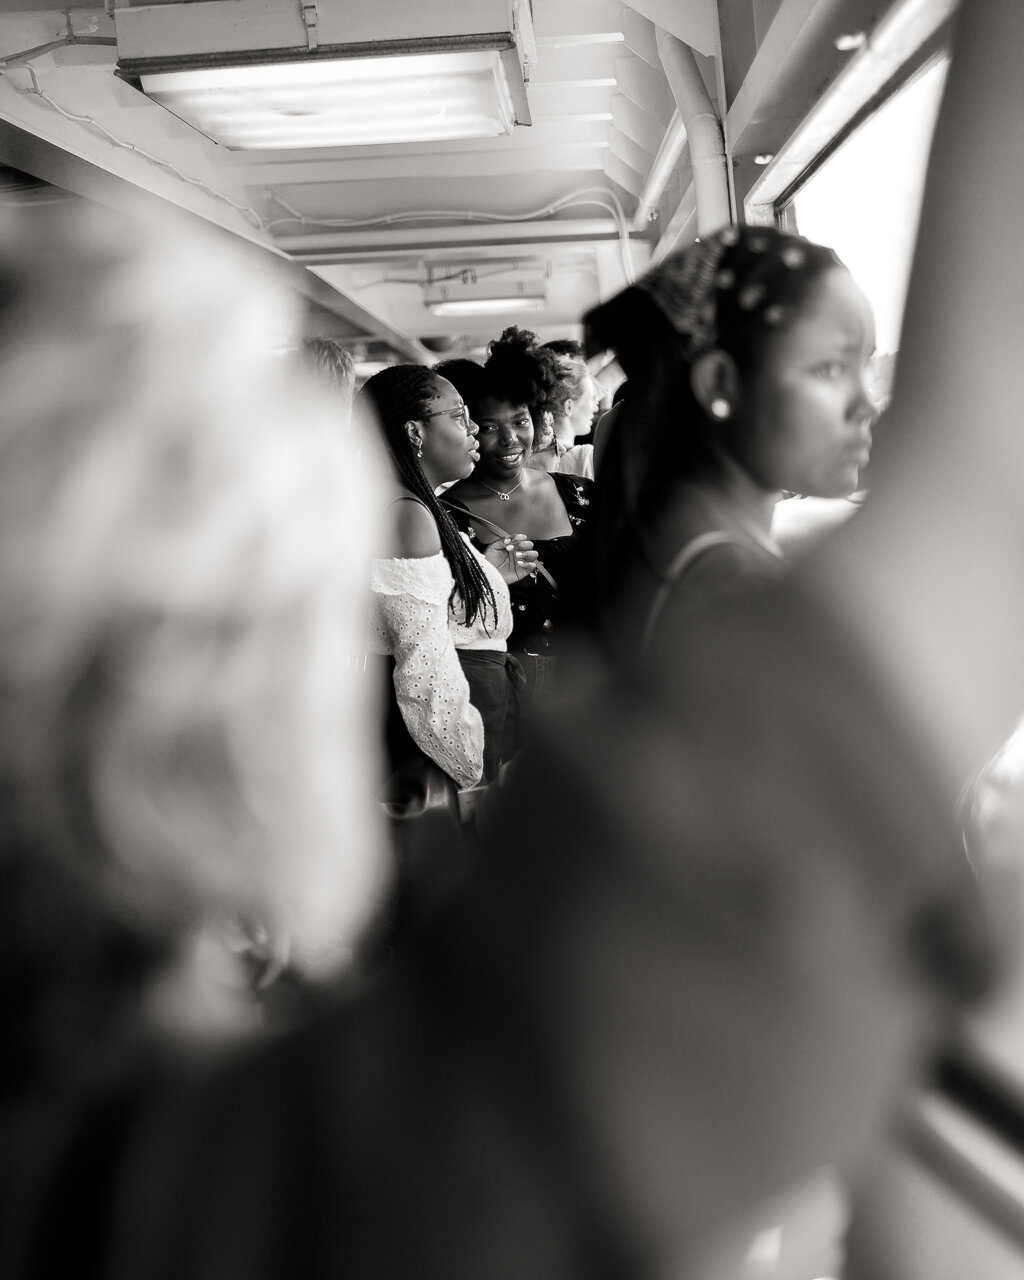 USA, New york, America, Amerika, streetphotography, Straßenfotofotografie, street, Straße, Alltag, everyday life, photo, Foto, photography, Fotografie, people, Menschen - bondarenko-ps_de+00003+_MGL3057.jpg